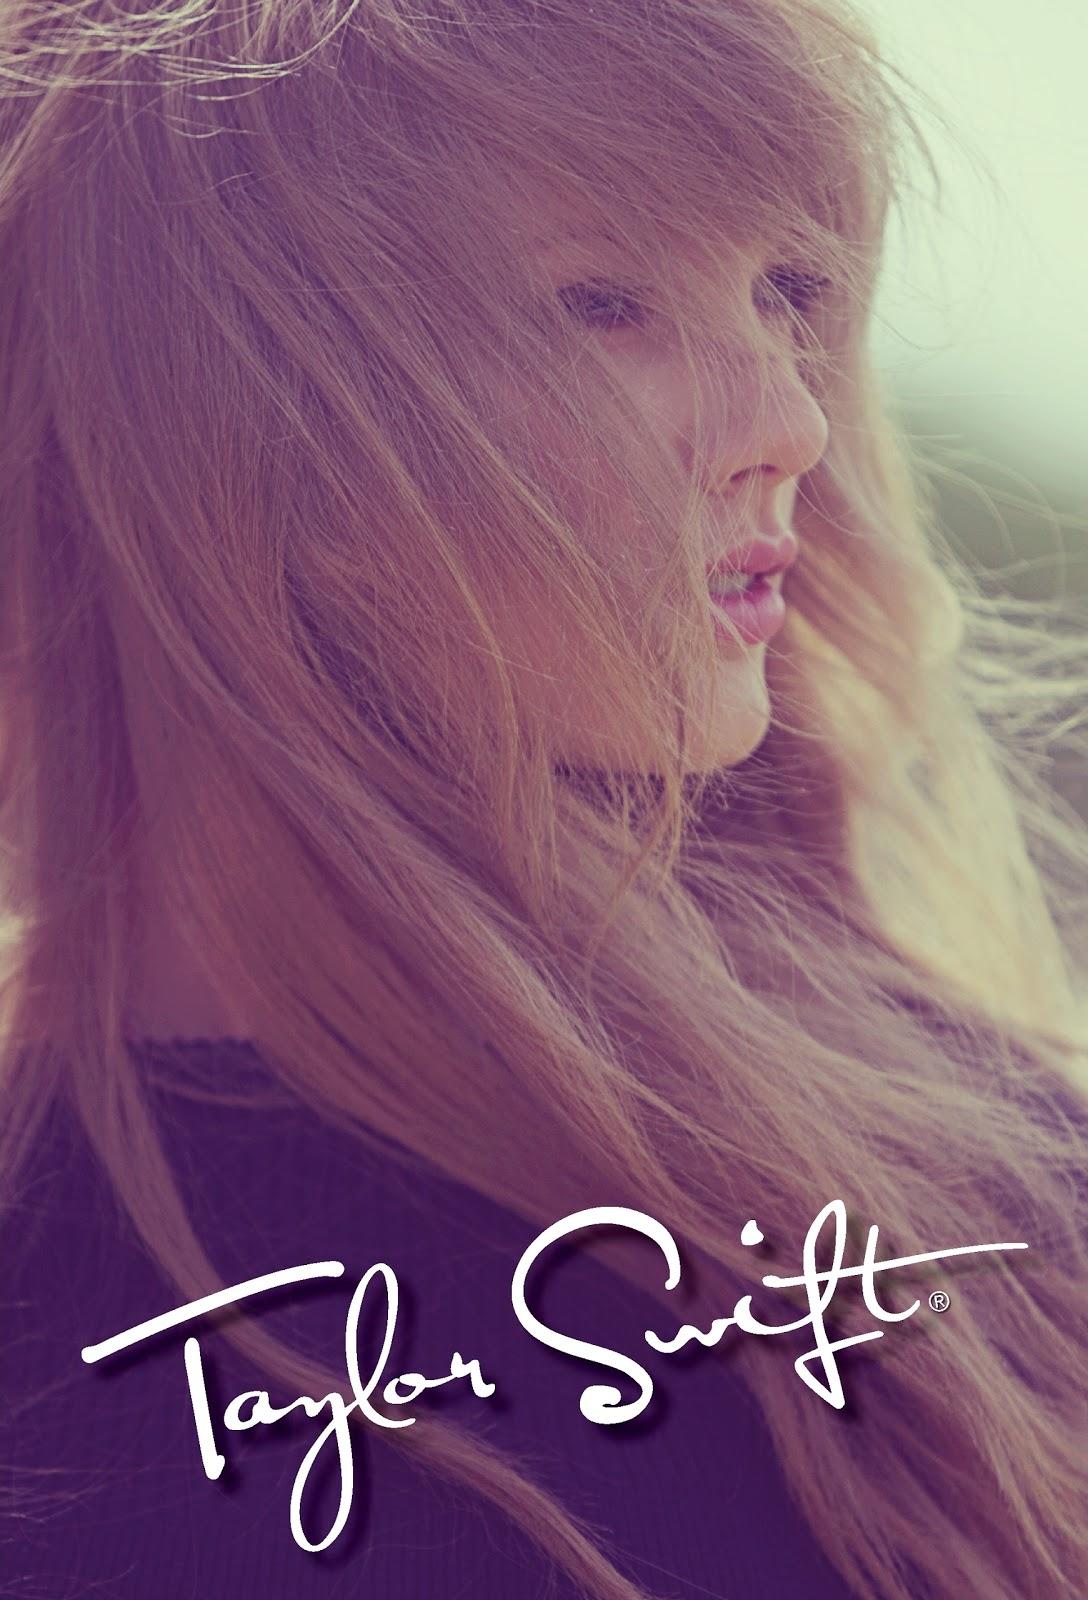 Lady Nerdy...Taylor Swift 泰勒絲歌詞中文翻譯: Taylor Swift - I Almost Do 中文翻譯歌詞